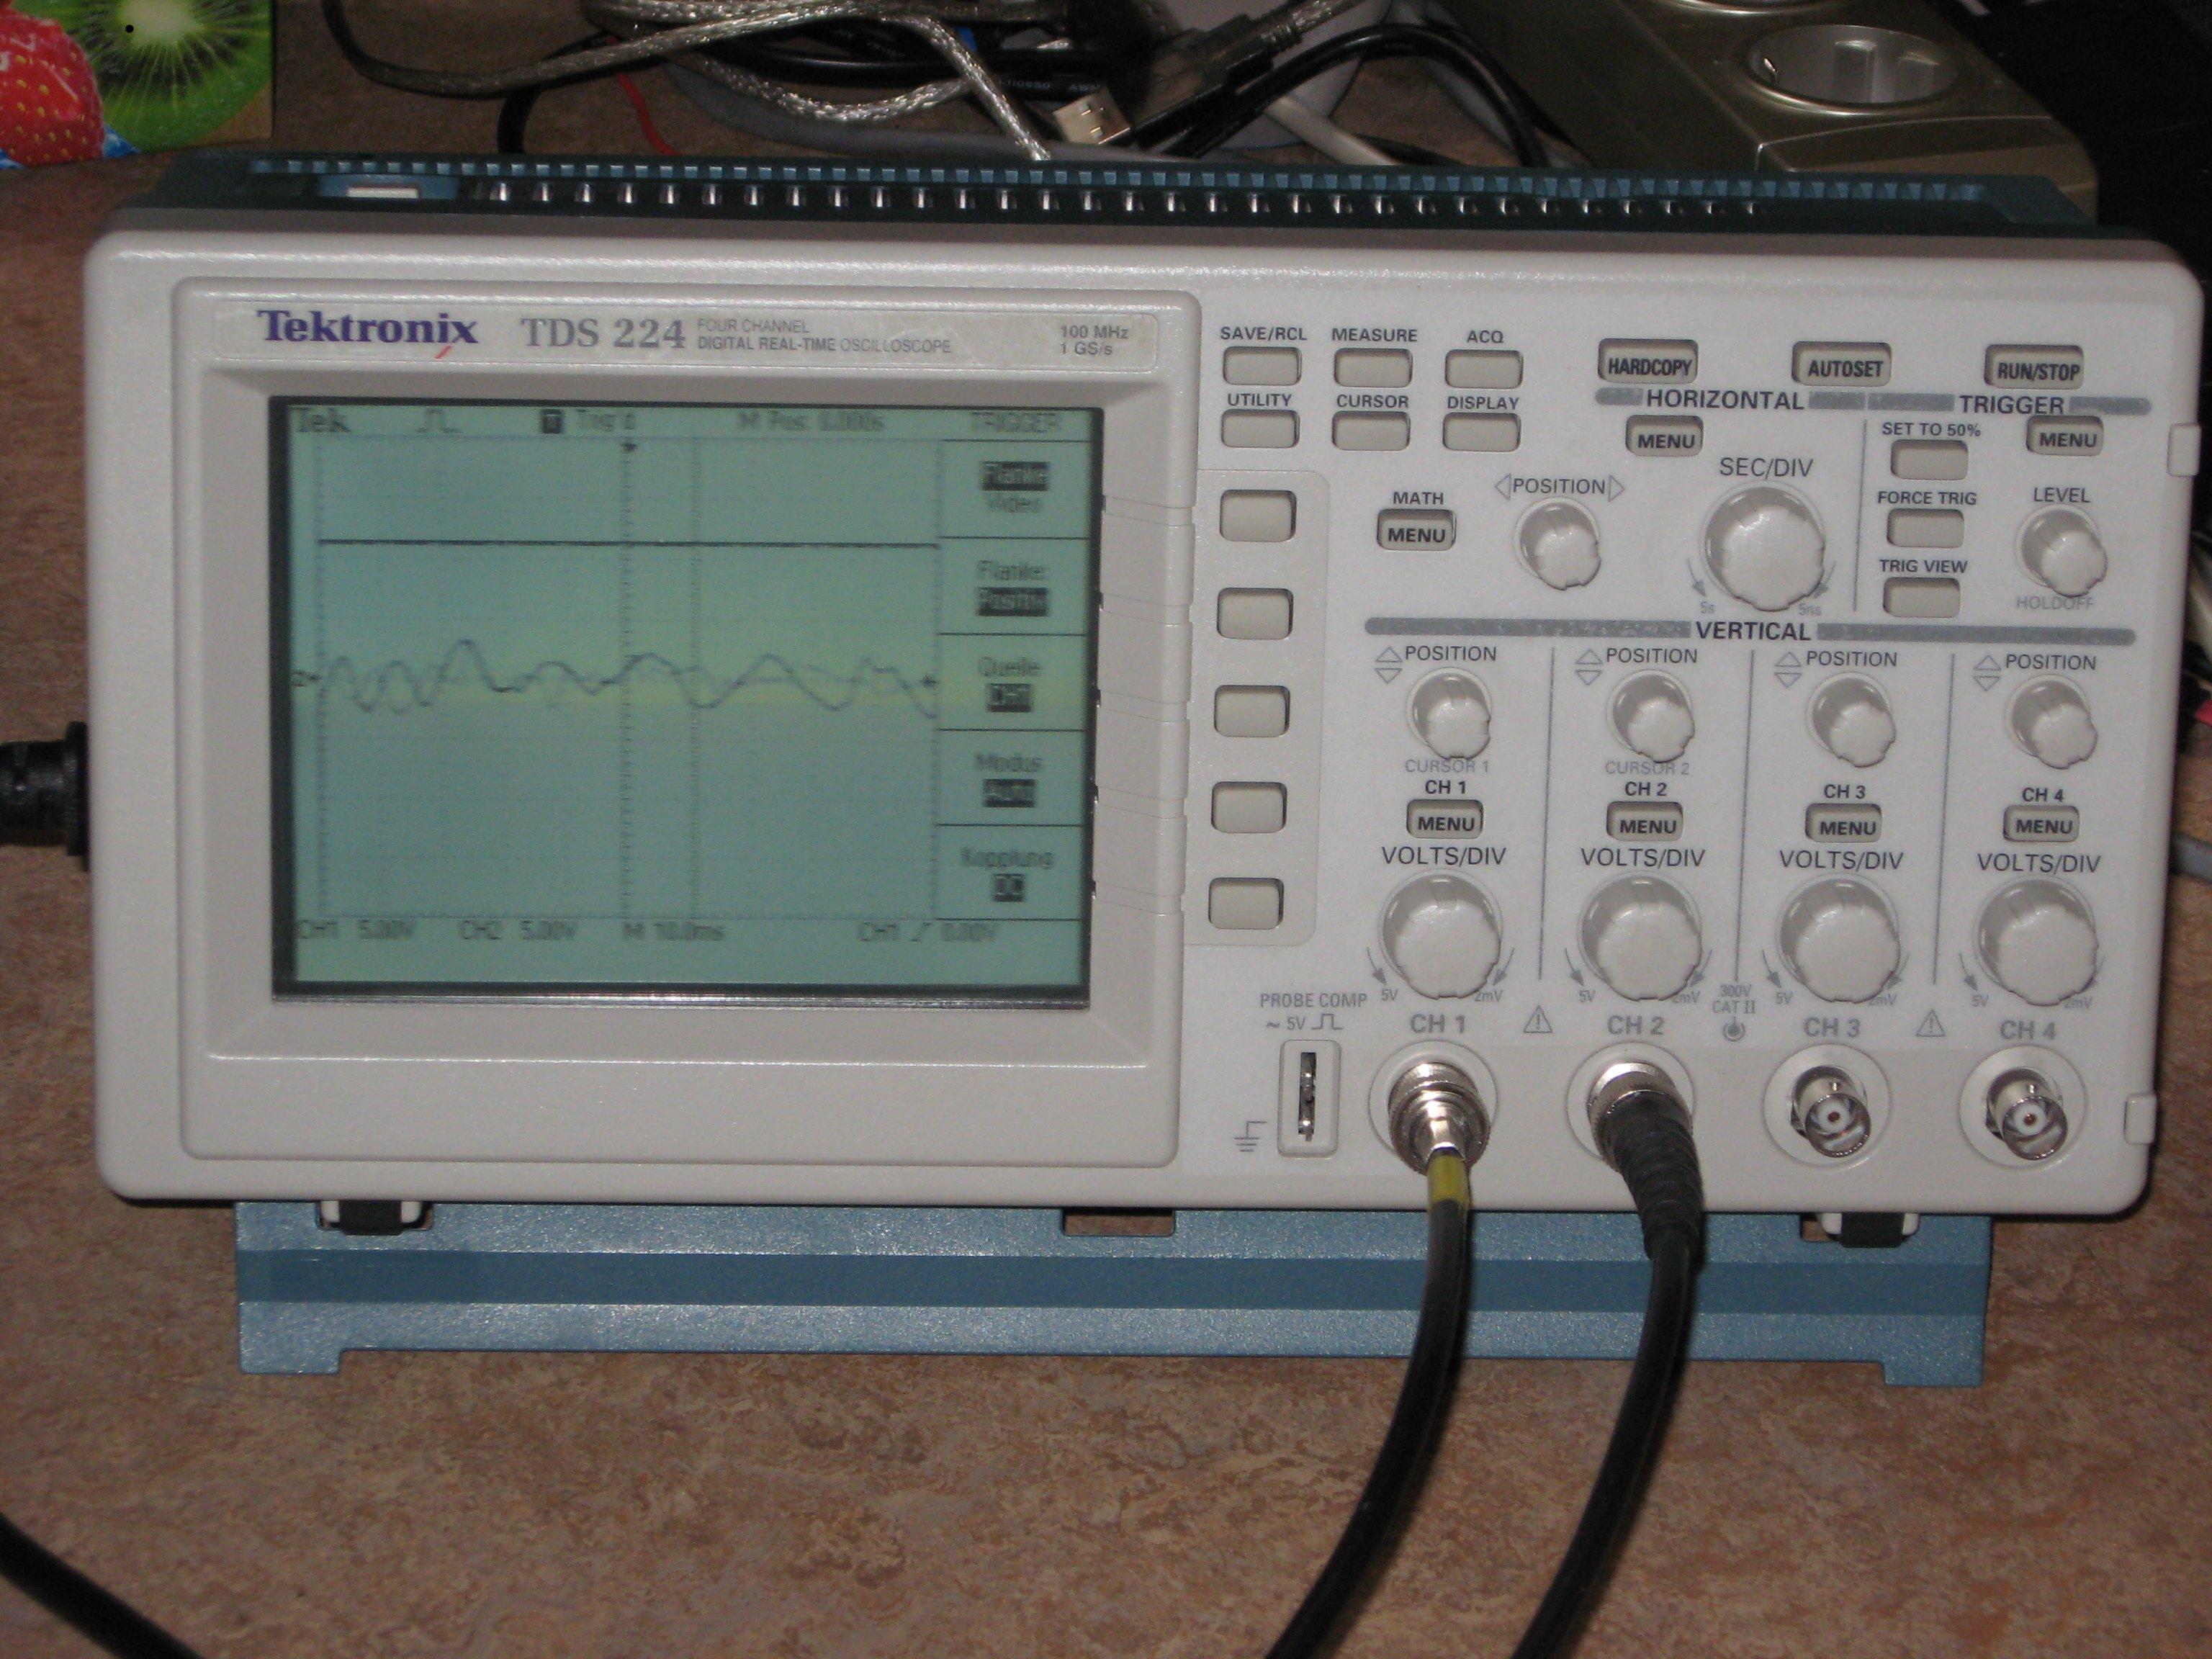 Tektronix 224 60mhz digital storage oscilloscope handheld.